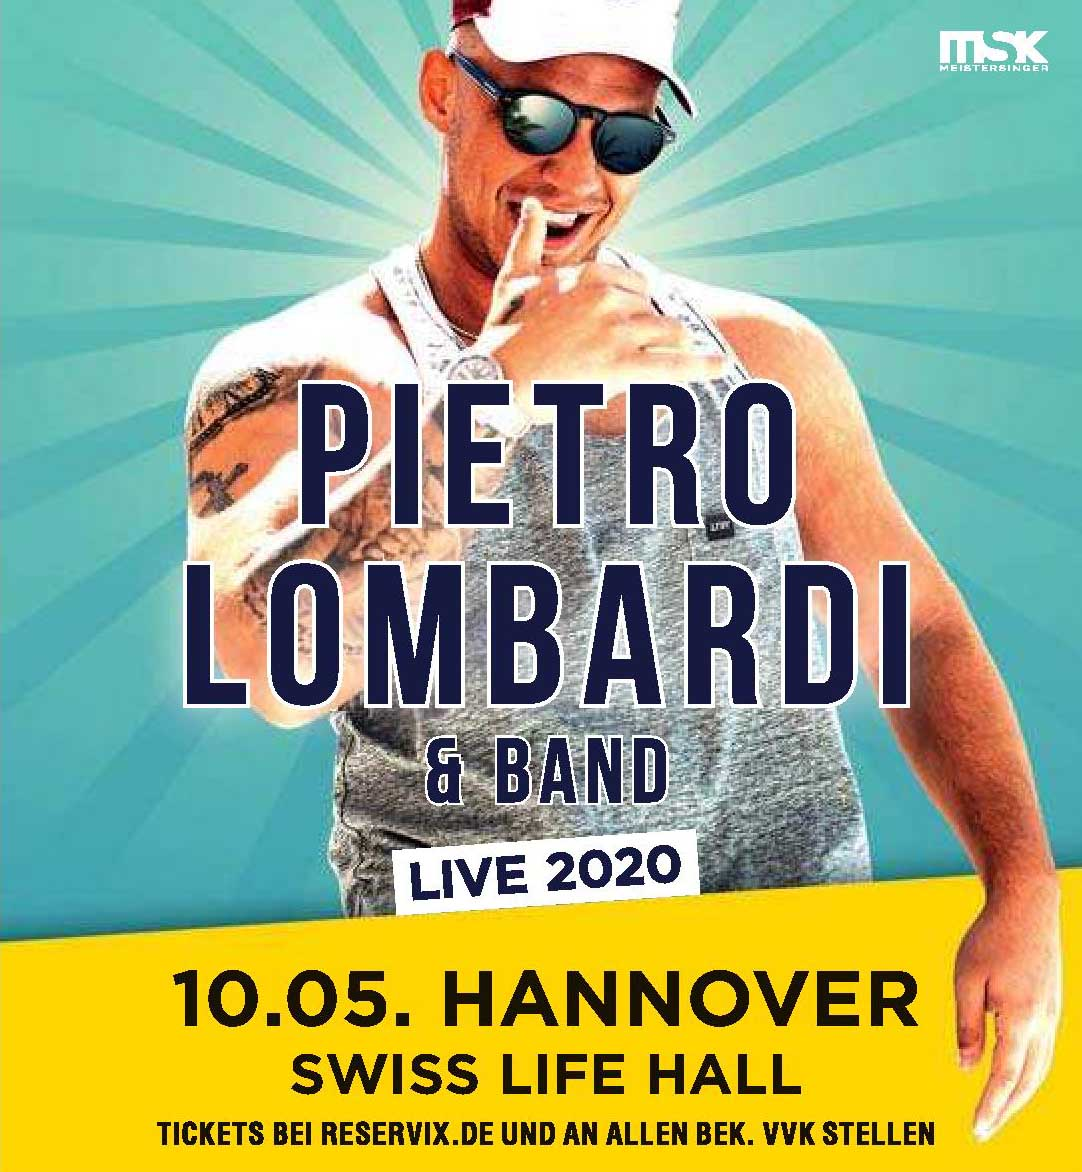 Pietro Lombardi & Band Live 2020